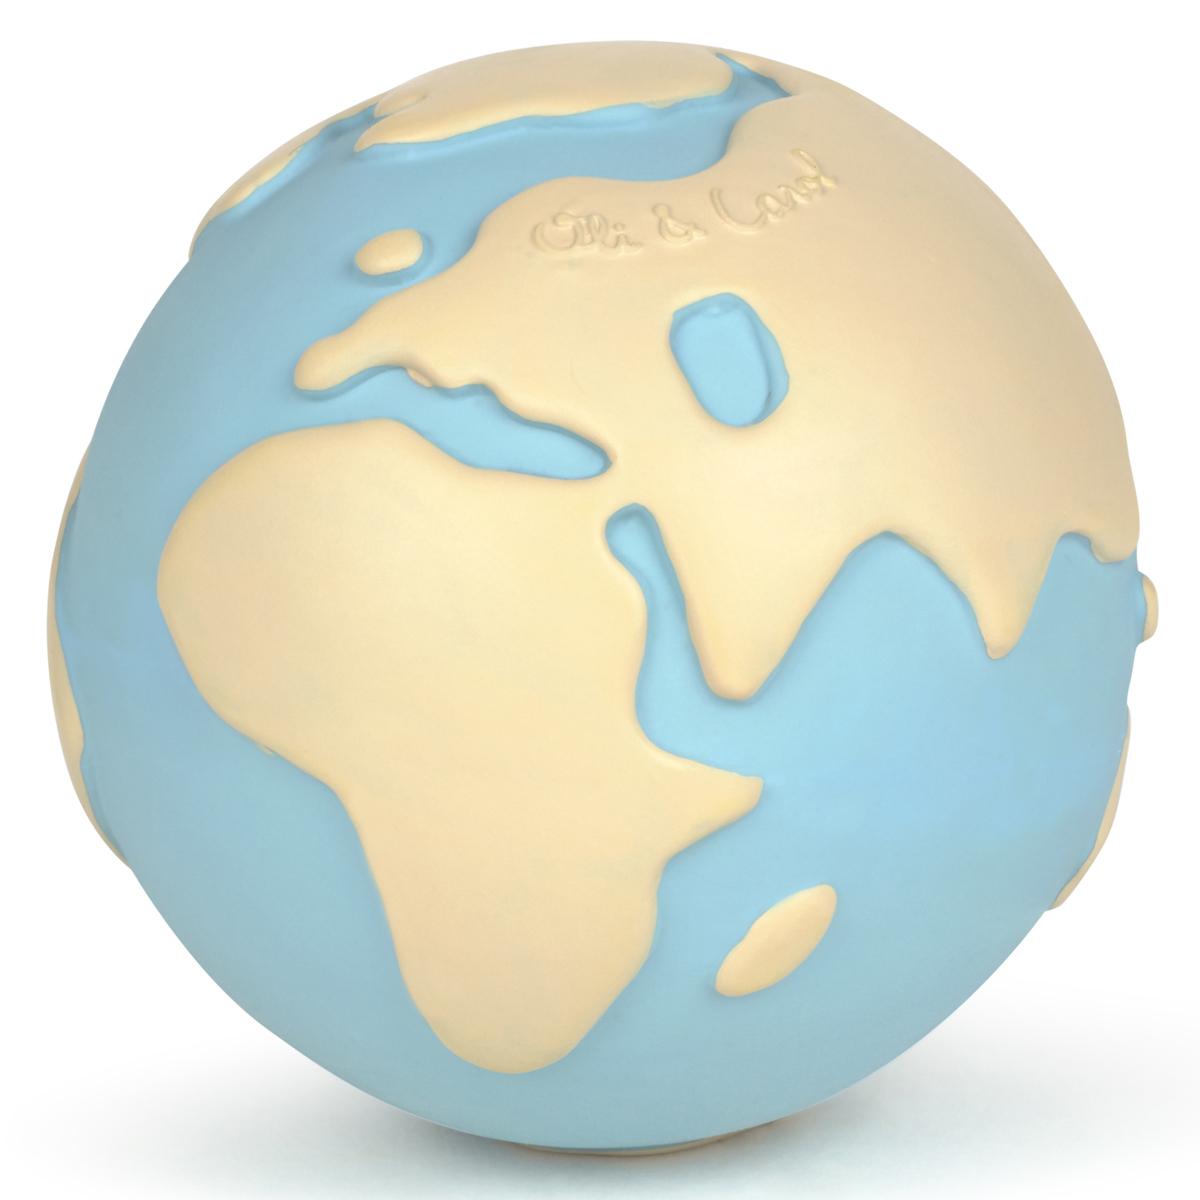 Dentition Jouet de Dentition Earthy the World Ball Jouet de Dentition Earthy the World Ball